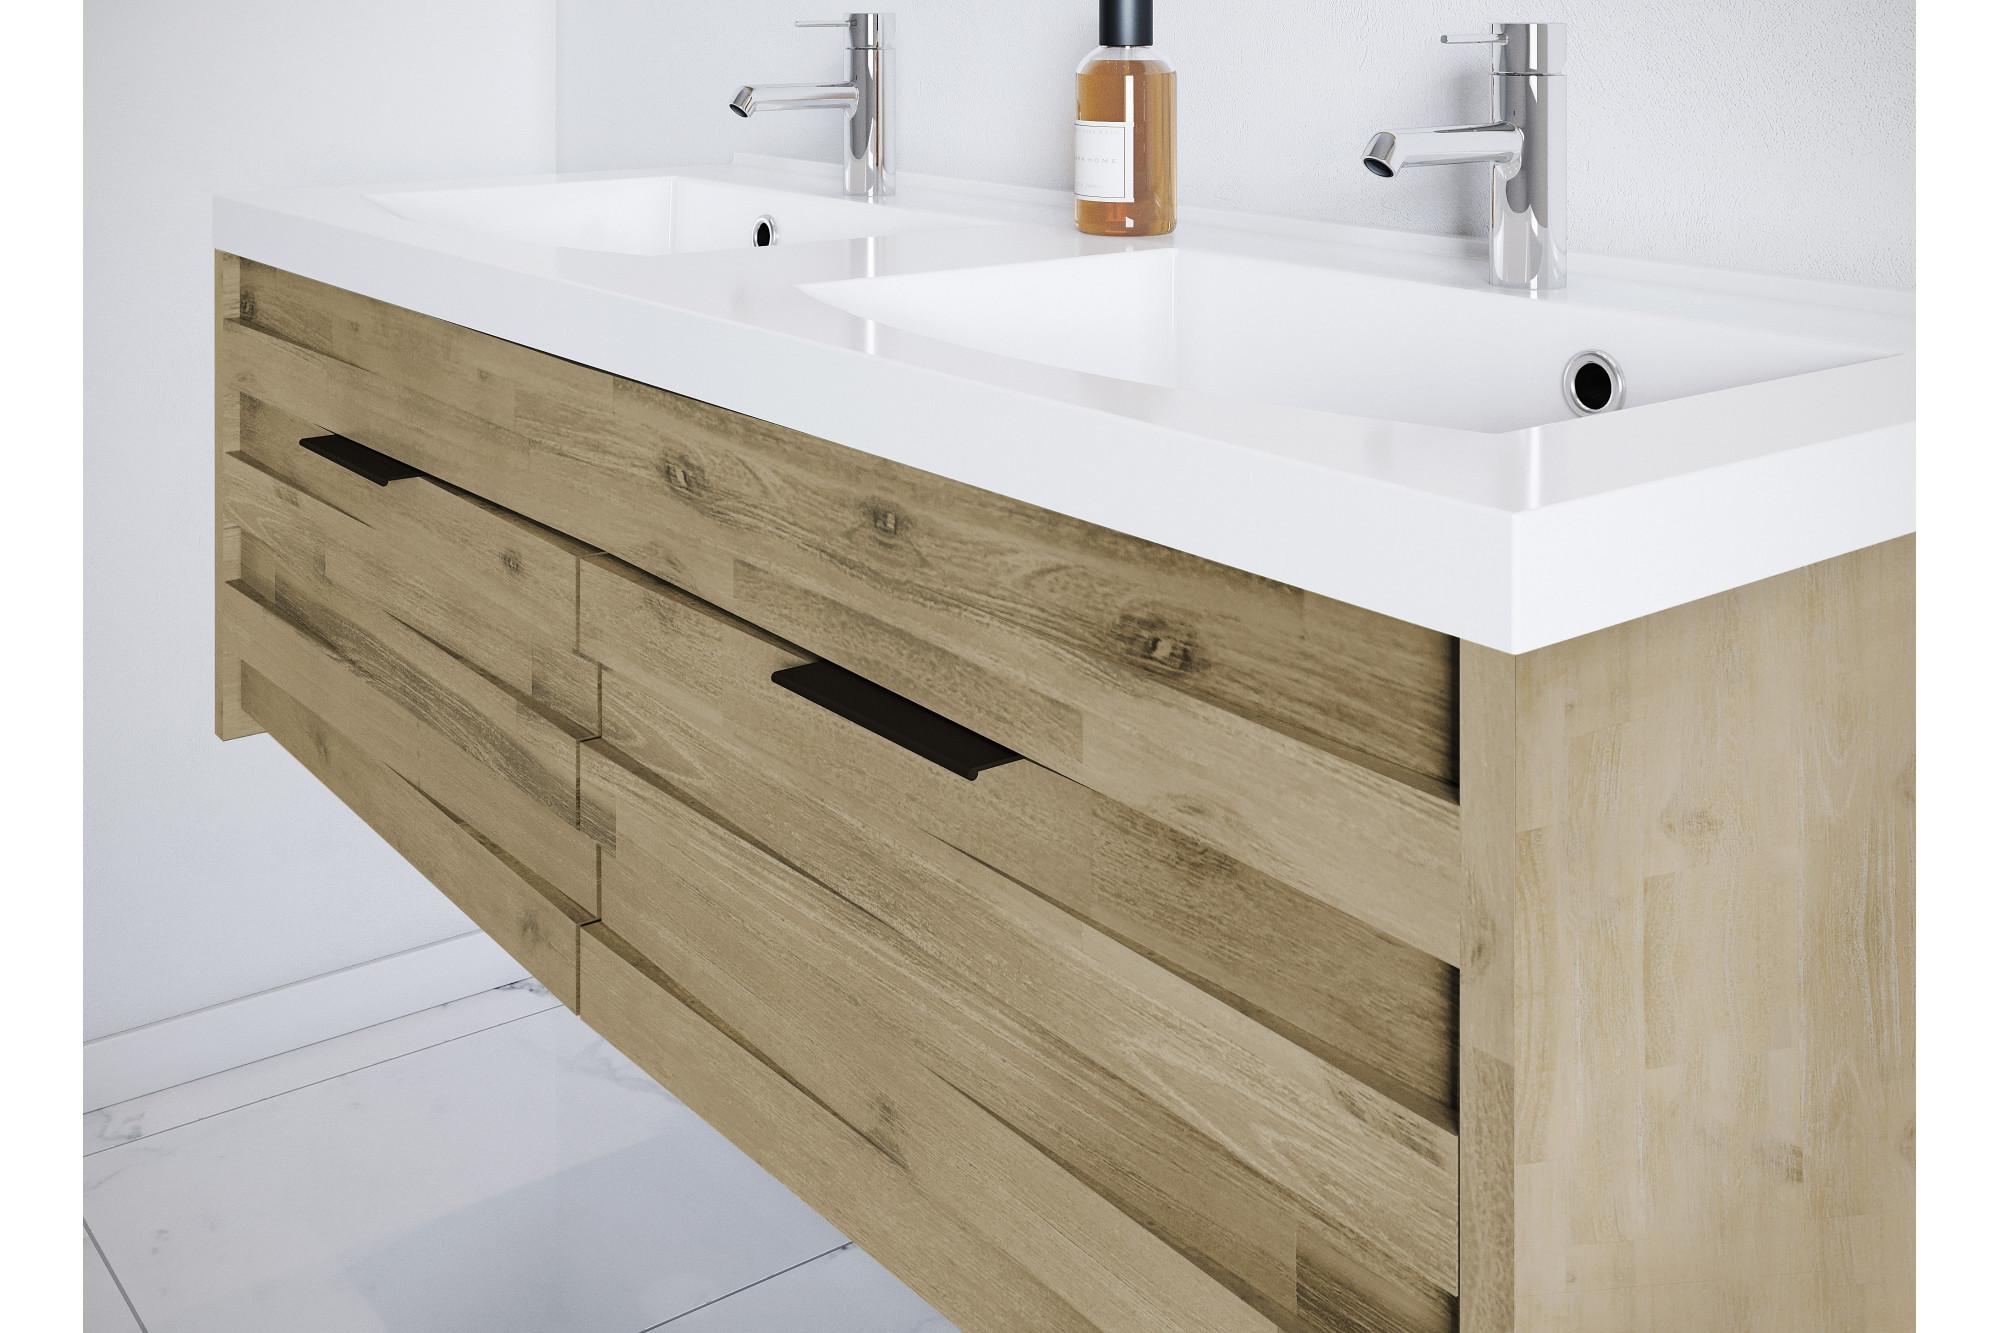 Salle De Bain Avec Bois meuble de salle de bain en bois massif (120 cm) - ensemble benoa